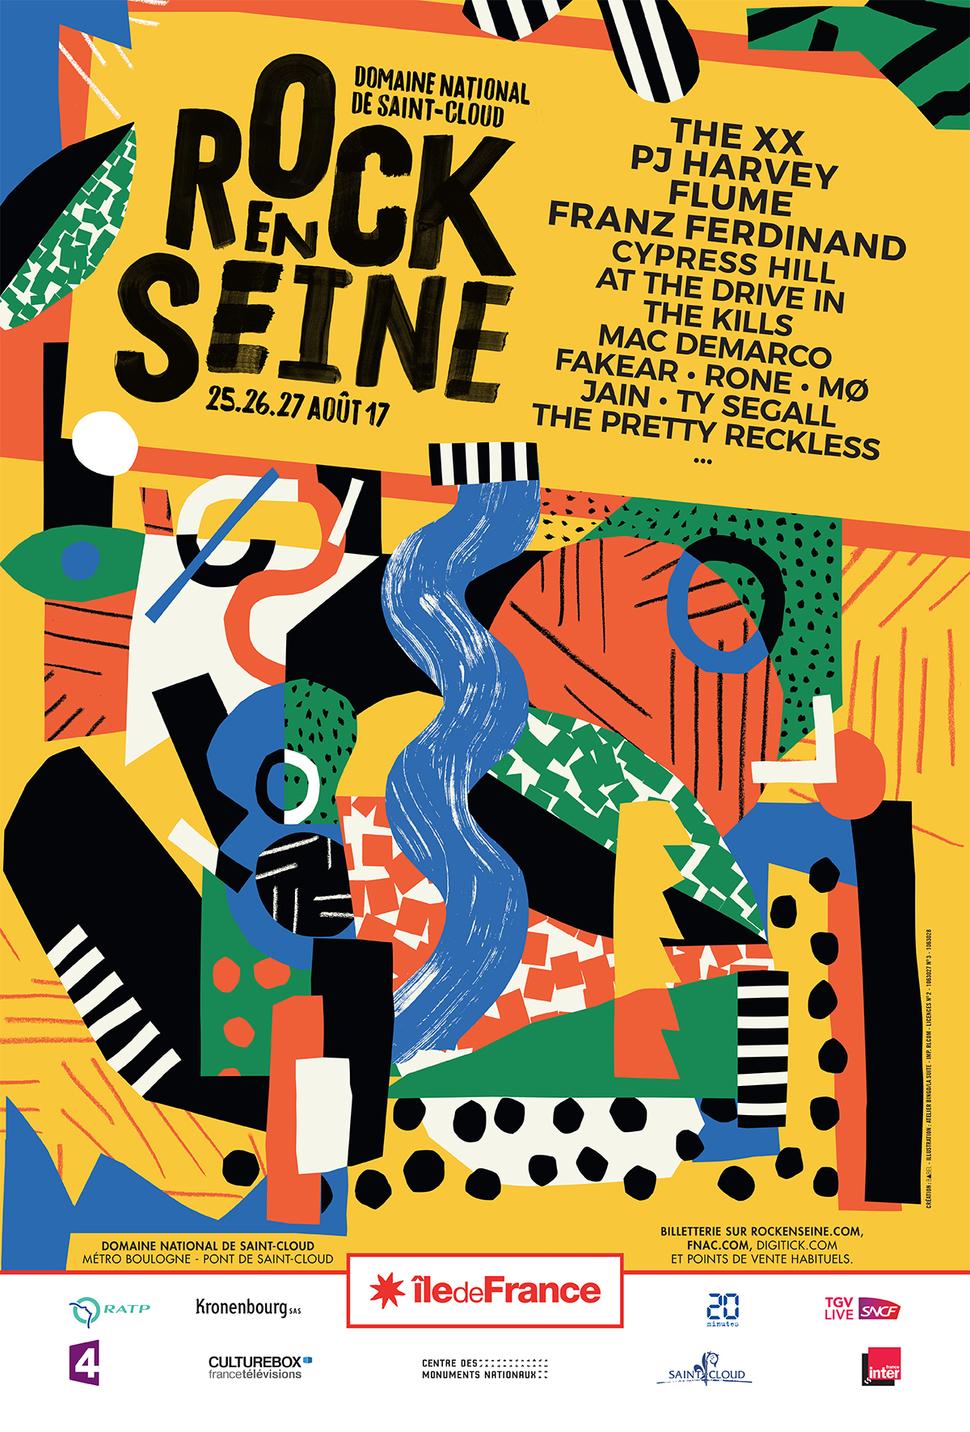 rock-en-seine-2017-affiche-programmation-folkr-01